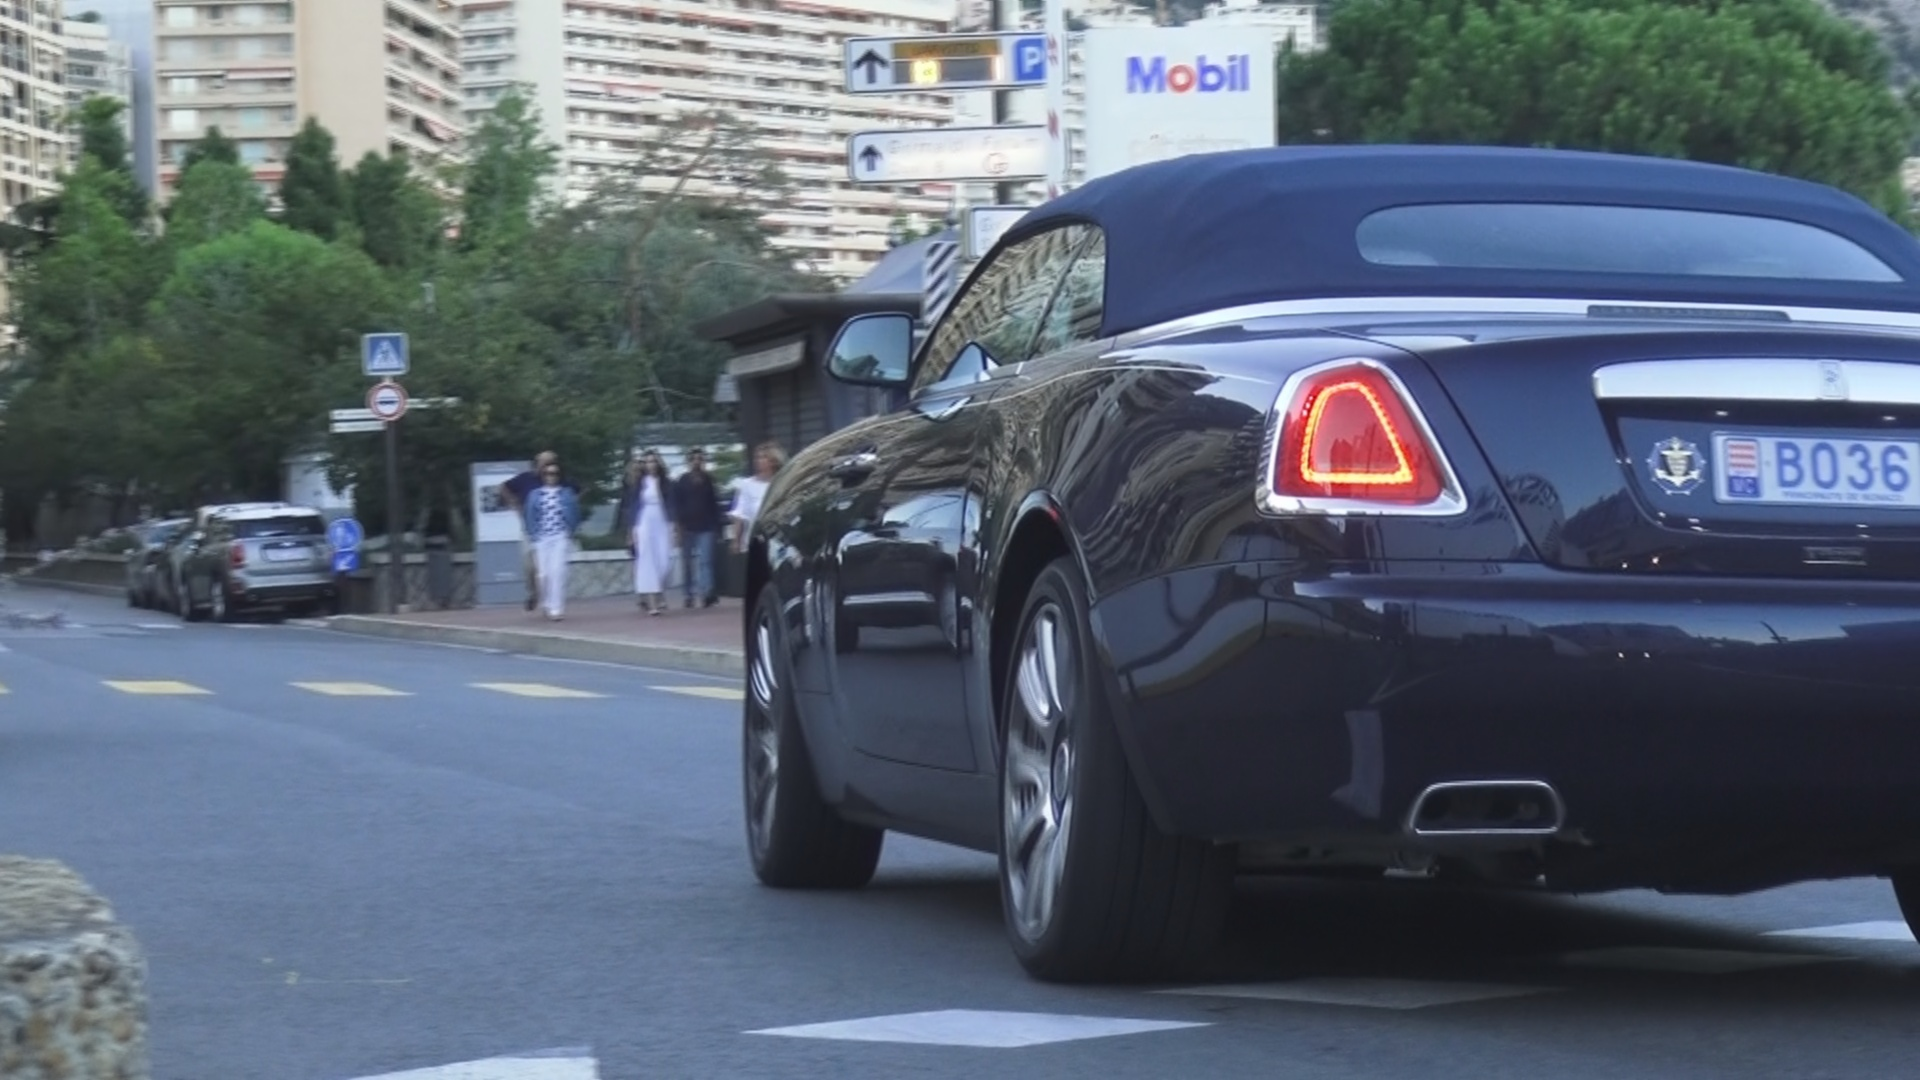 Rolls Royce Dawn - B036 (MC)